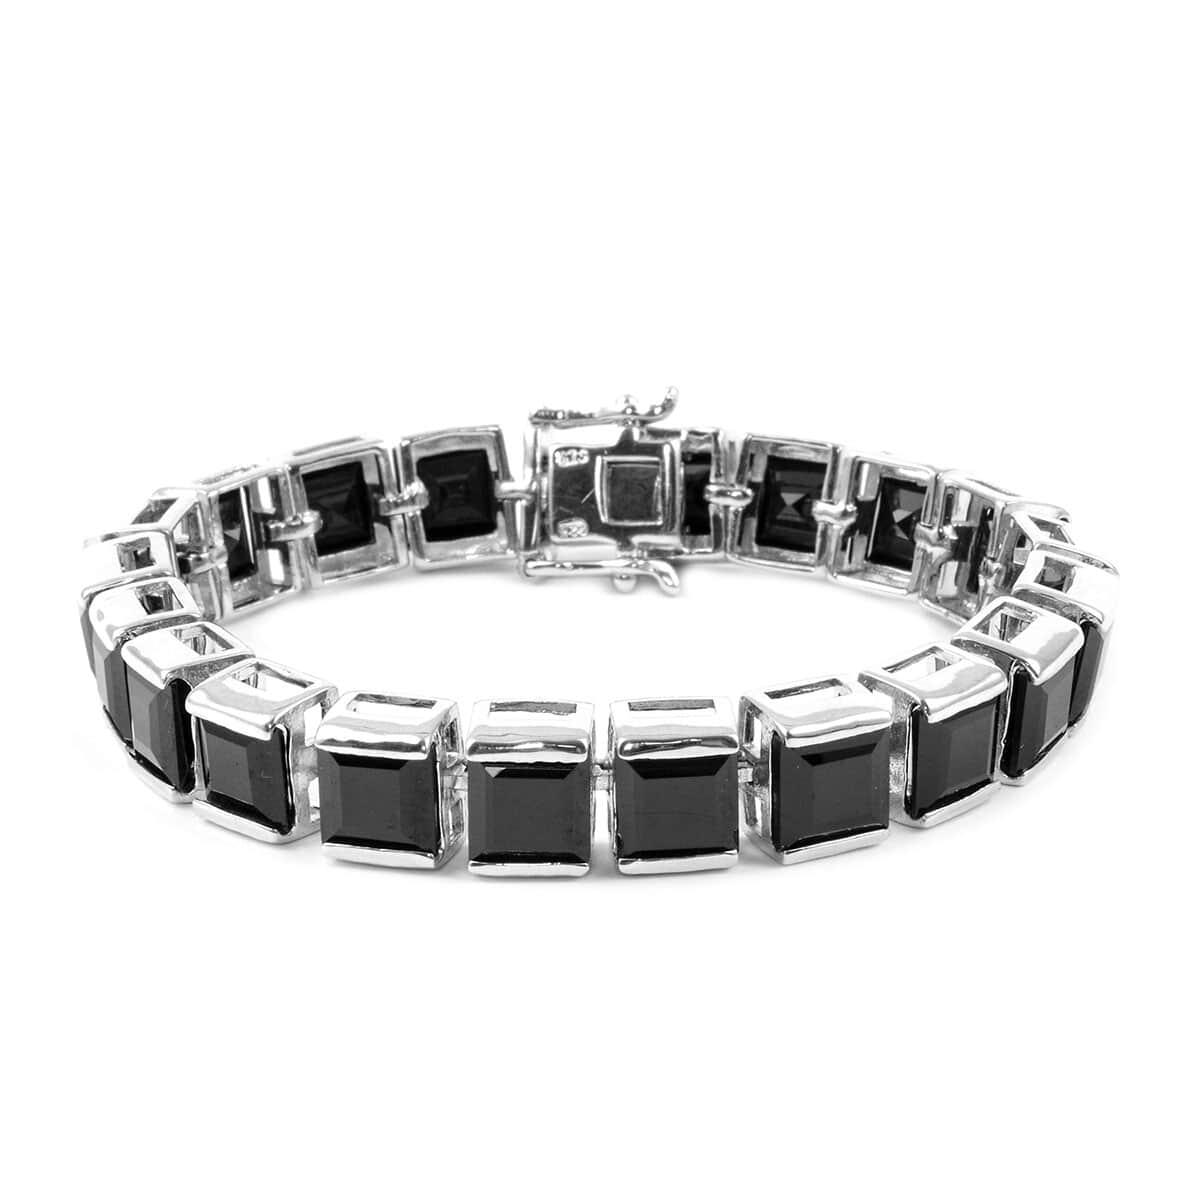 Thai Black Spinel Bracelet in Platinum Over Sterling Silver (6 50 In) (25  g) 44 20 ctw